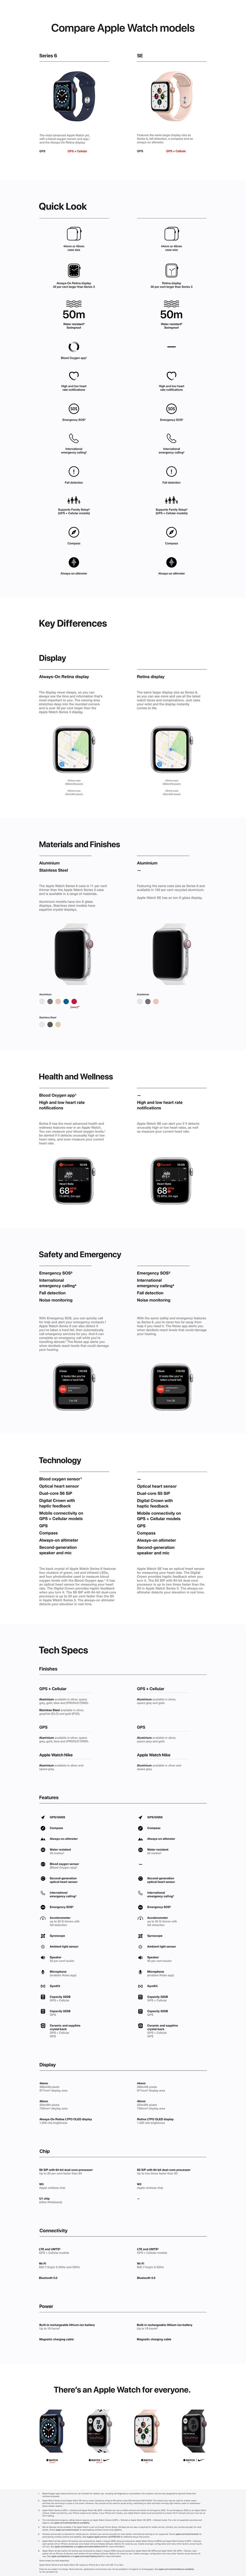 apple-watch-compare.jpg